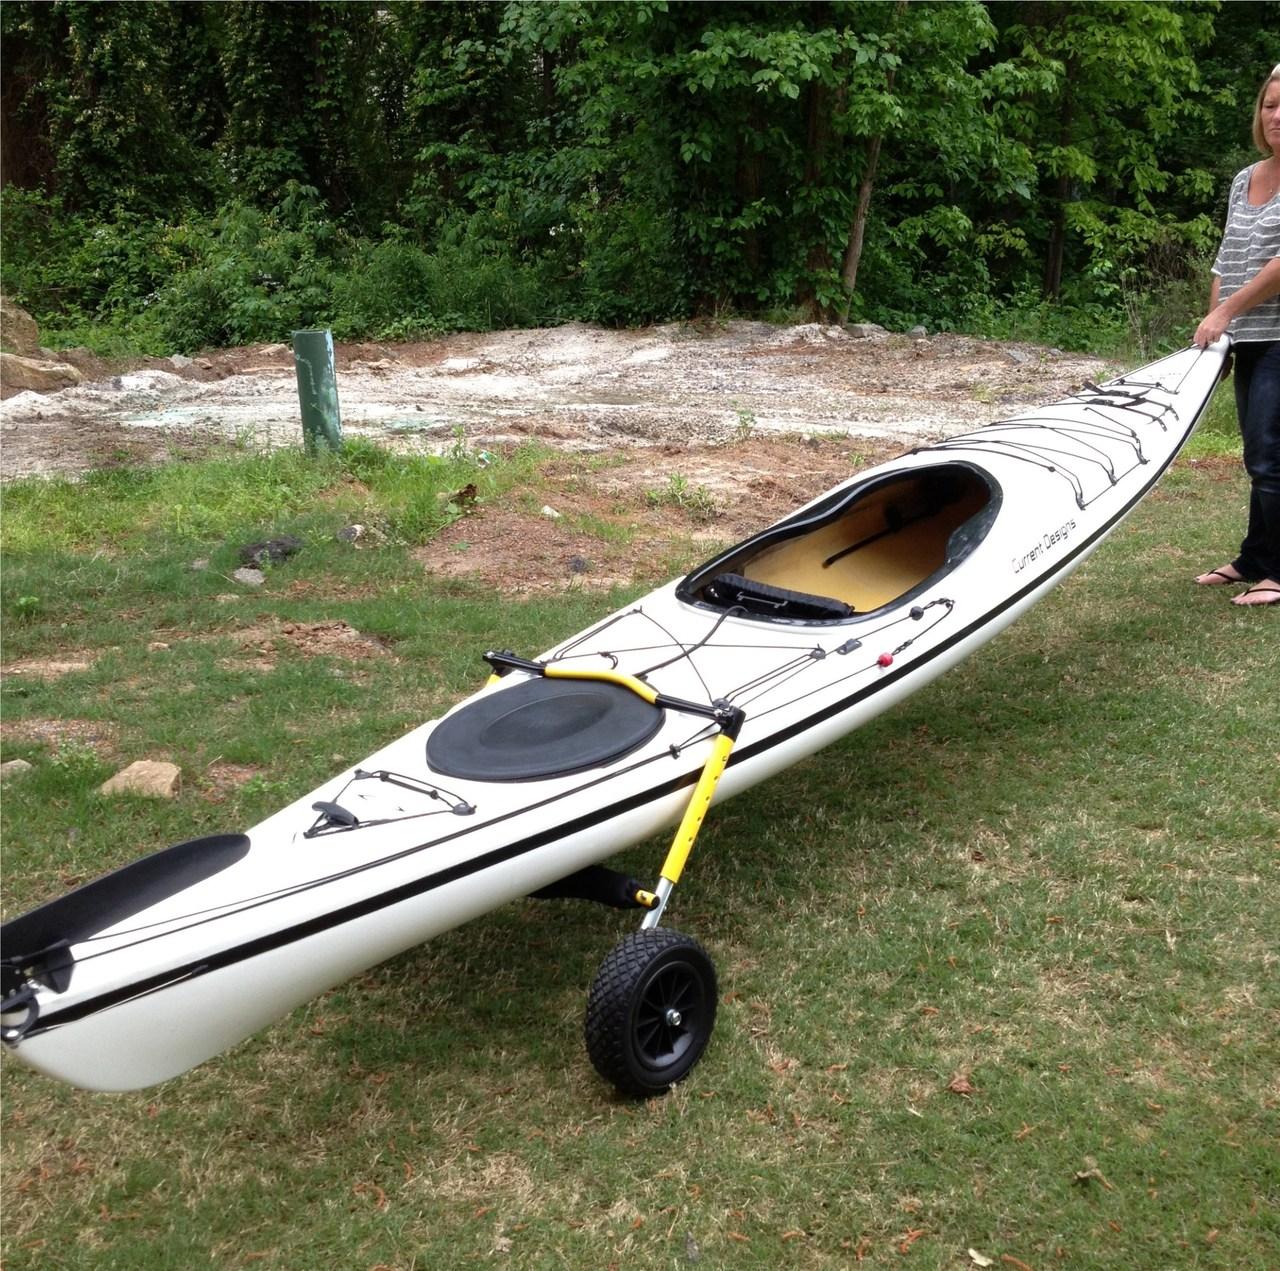 Stern Mount Kayak Dolly Suspenz Boat Carrier